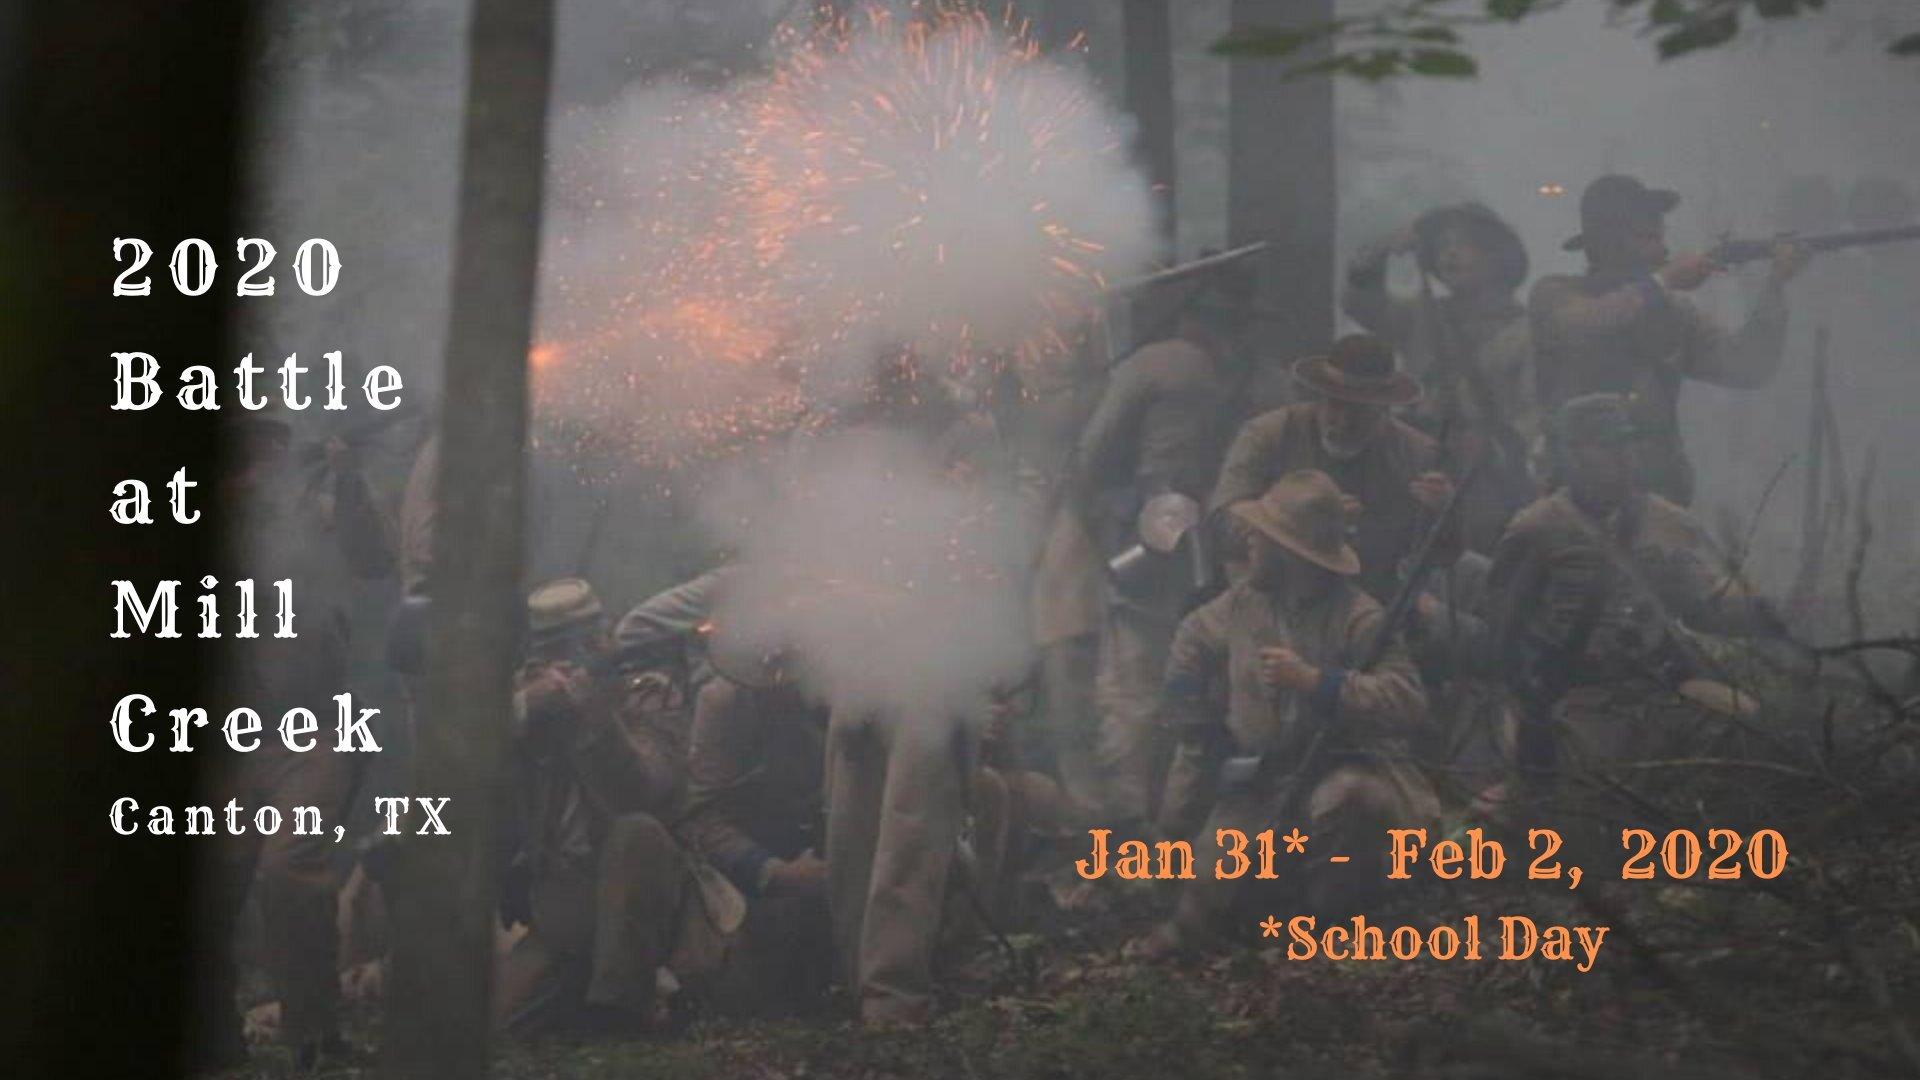 Battle At Mill Creek Canton - Civil War Reenactment regarding 1St Monday Canton Texas 2022 Calender